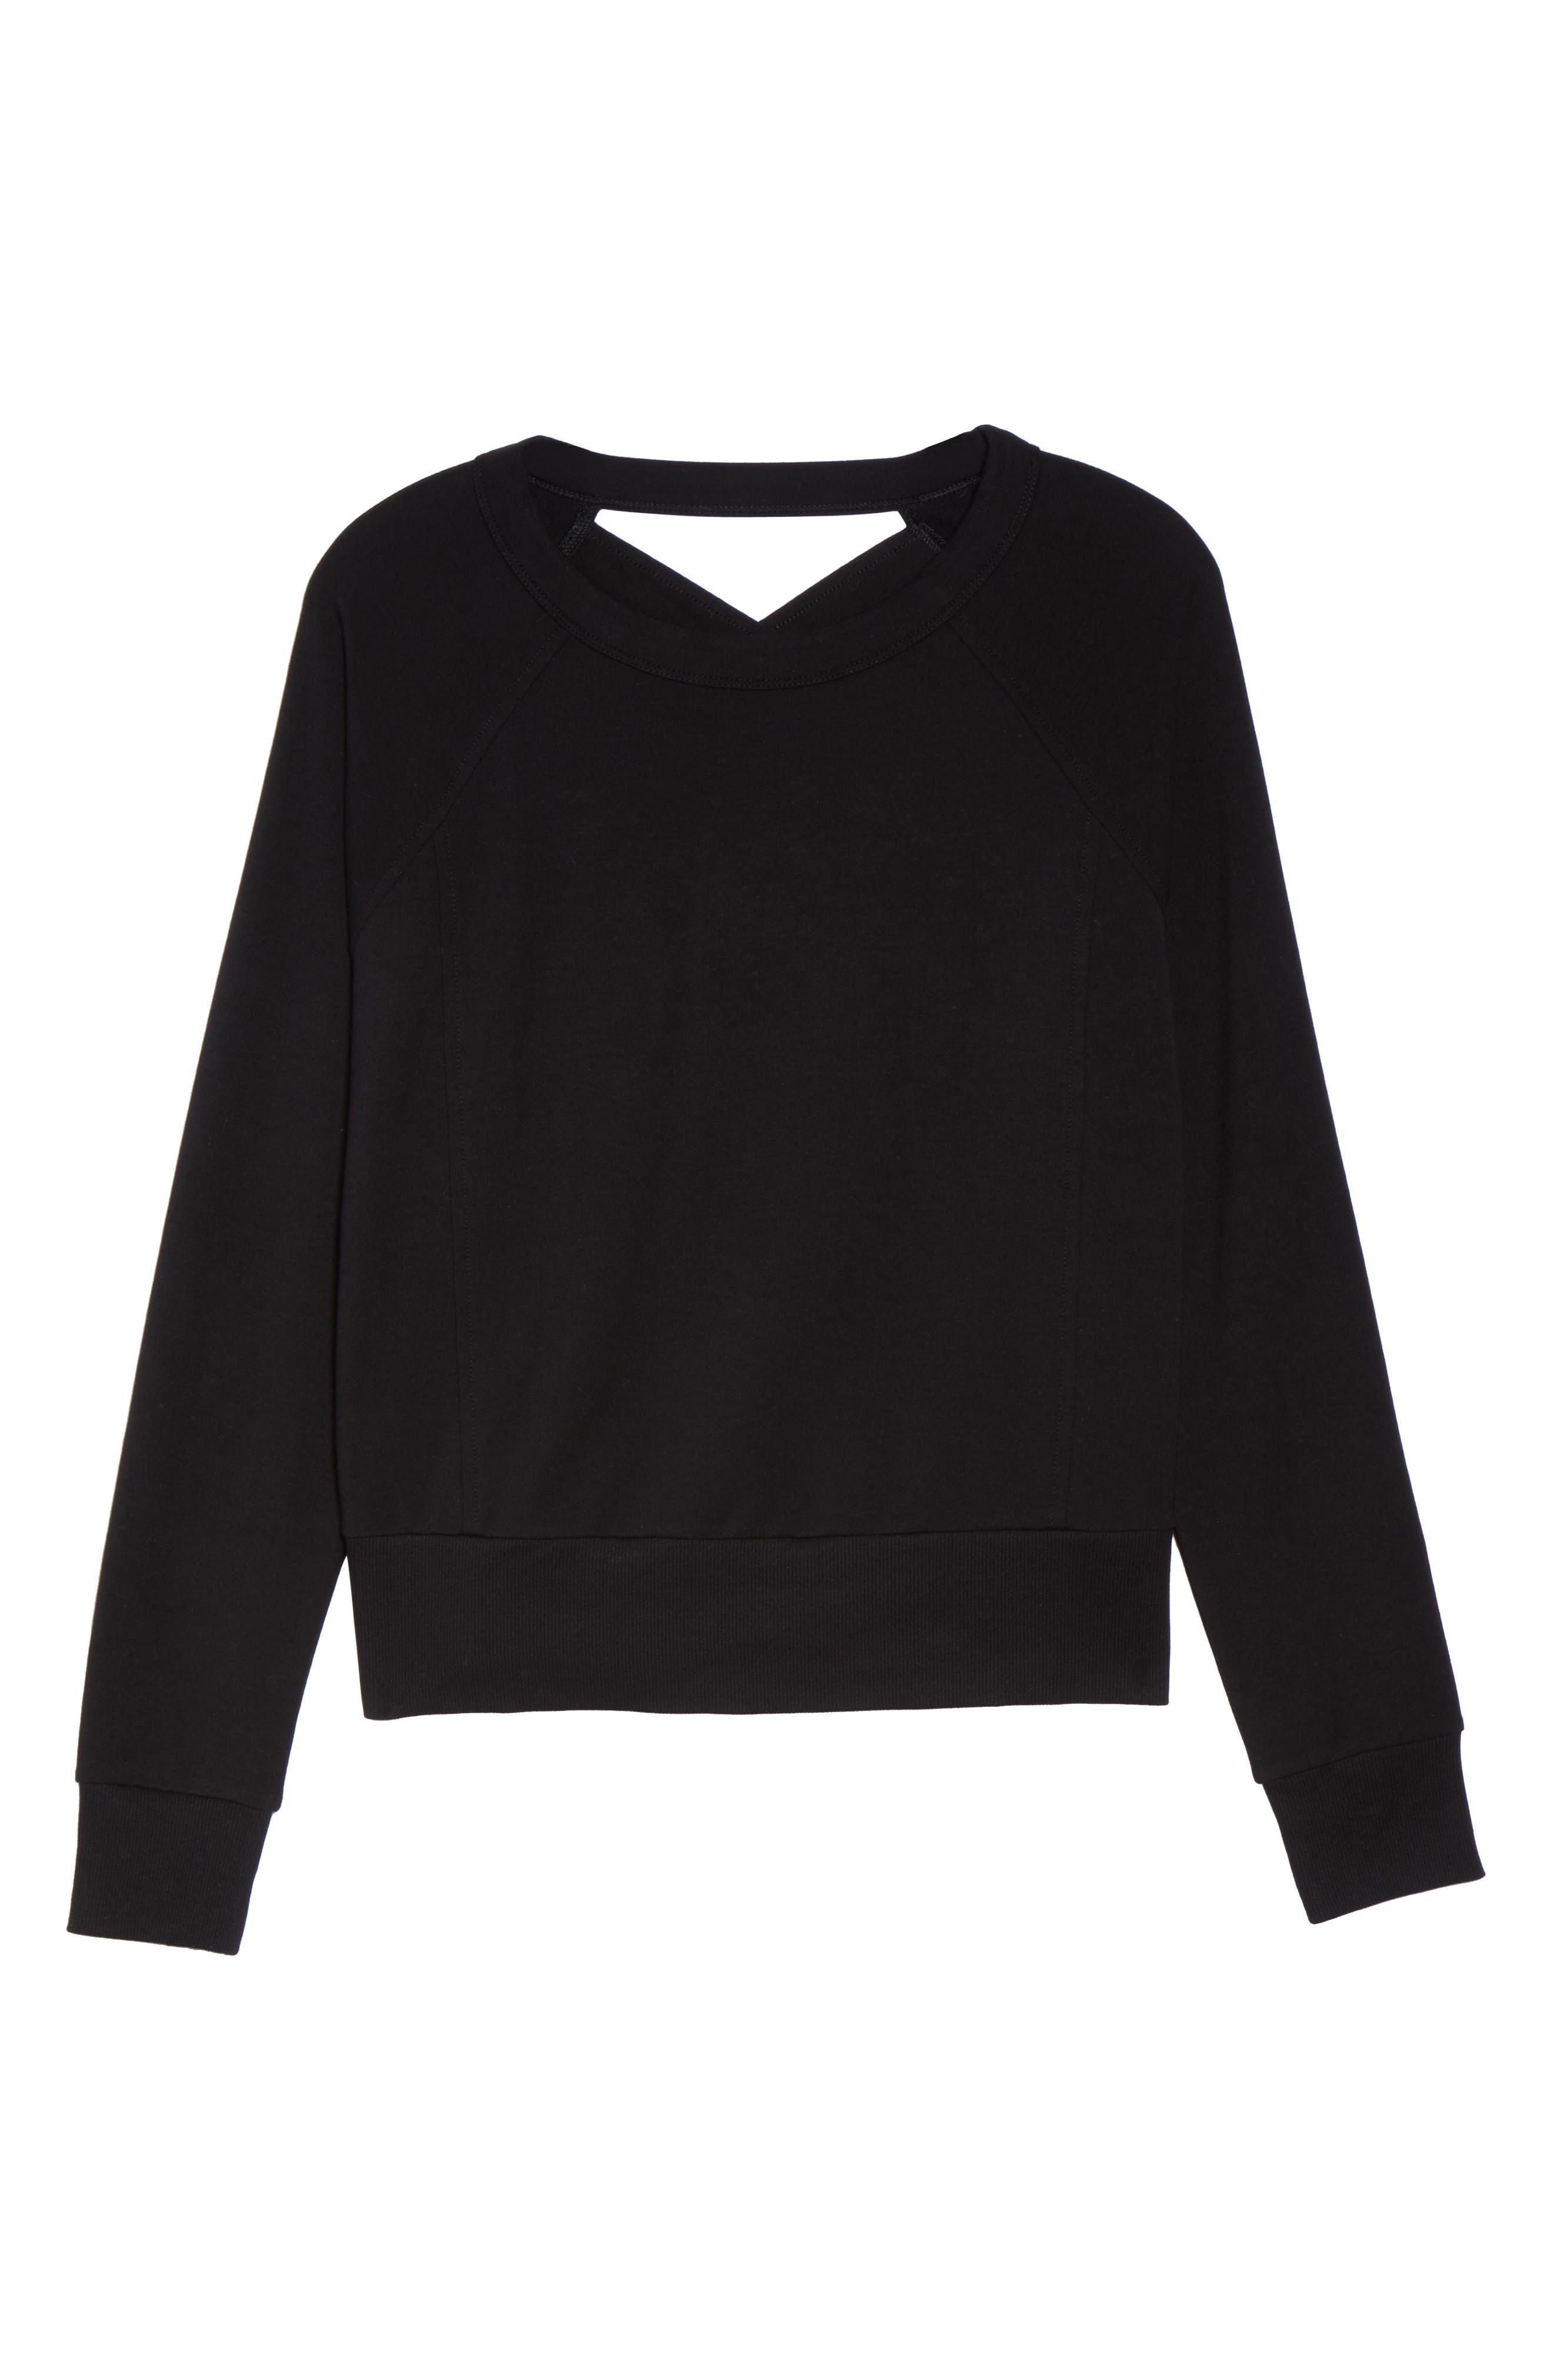 Covet Crisscross Sweatshirt,                             Alternate thumbnail 7, color,                             001